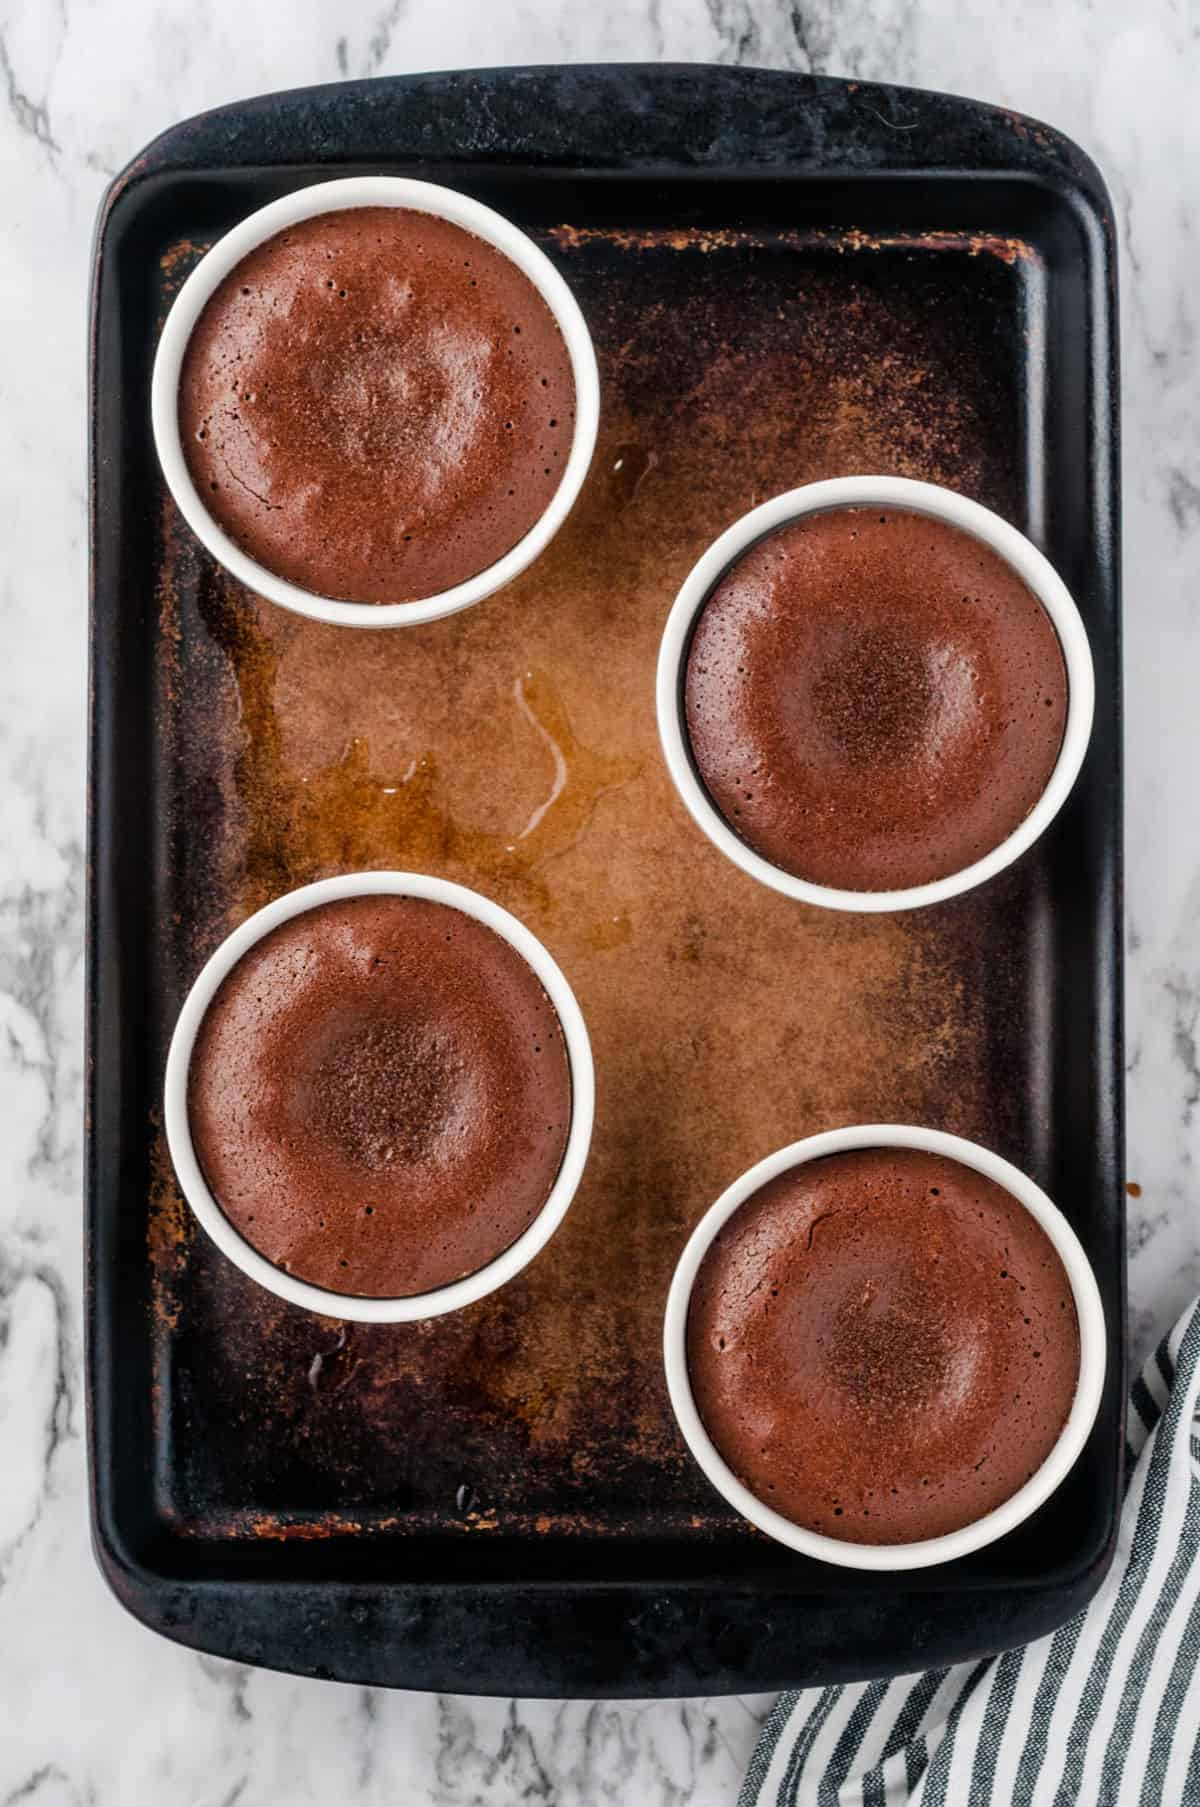 Chocolate Melting Cake on a baking pan baked